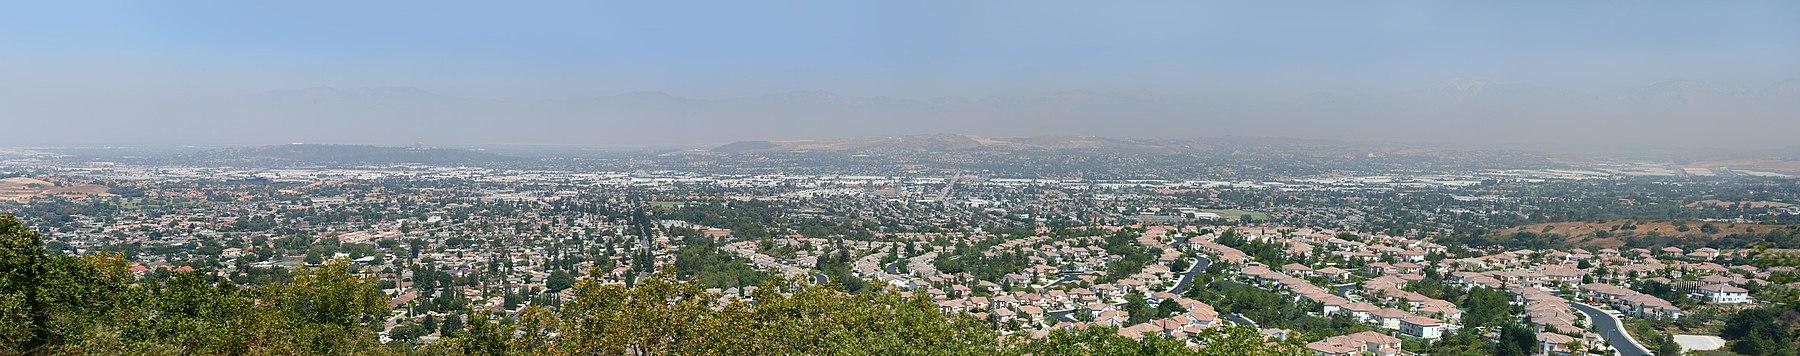 Rowland Heights Hills.jpg